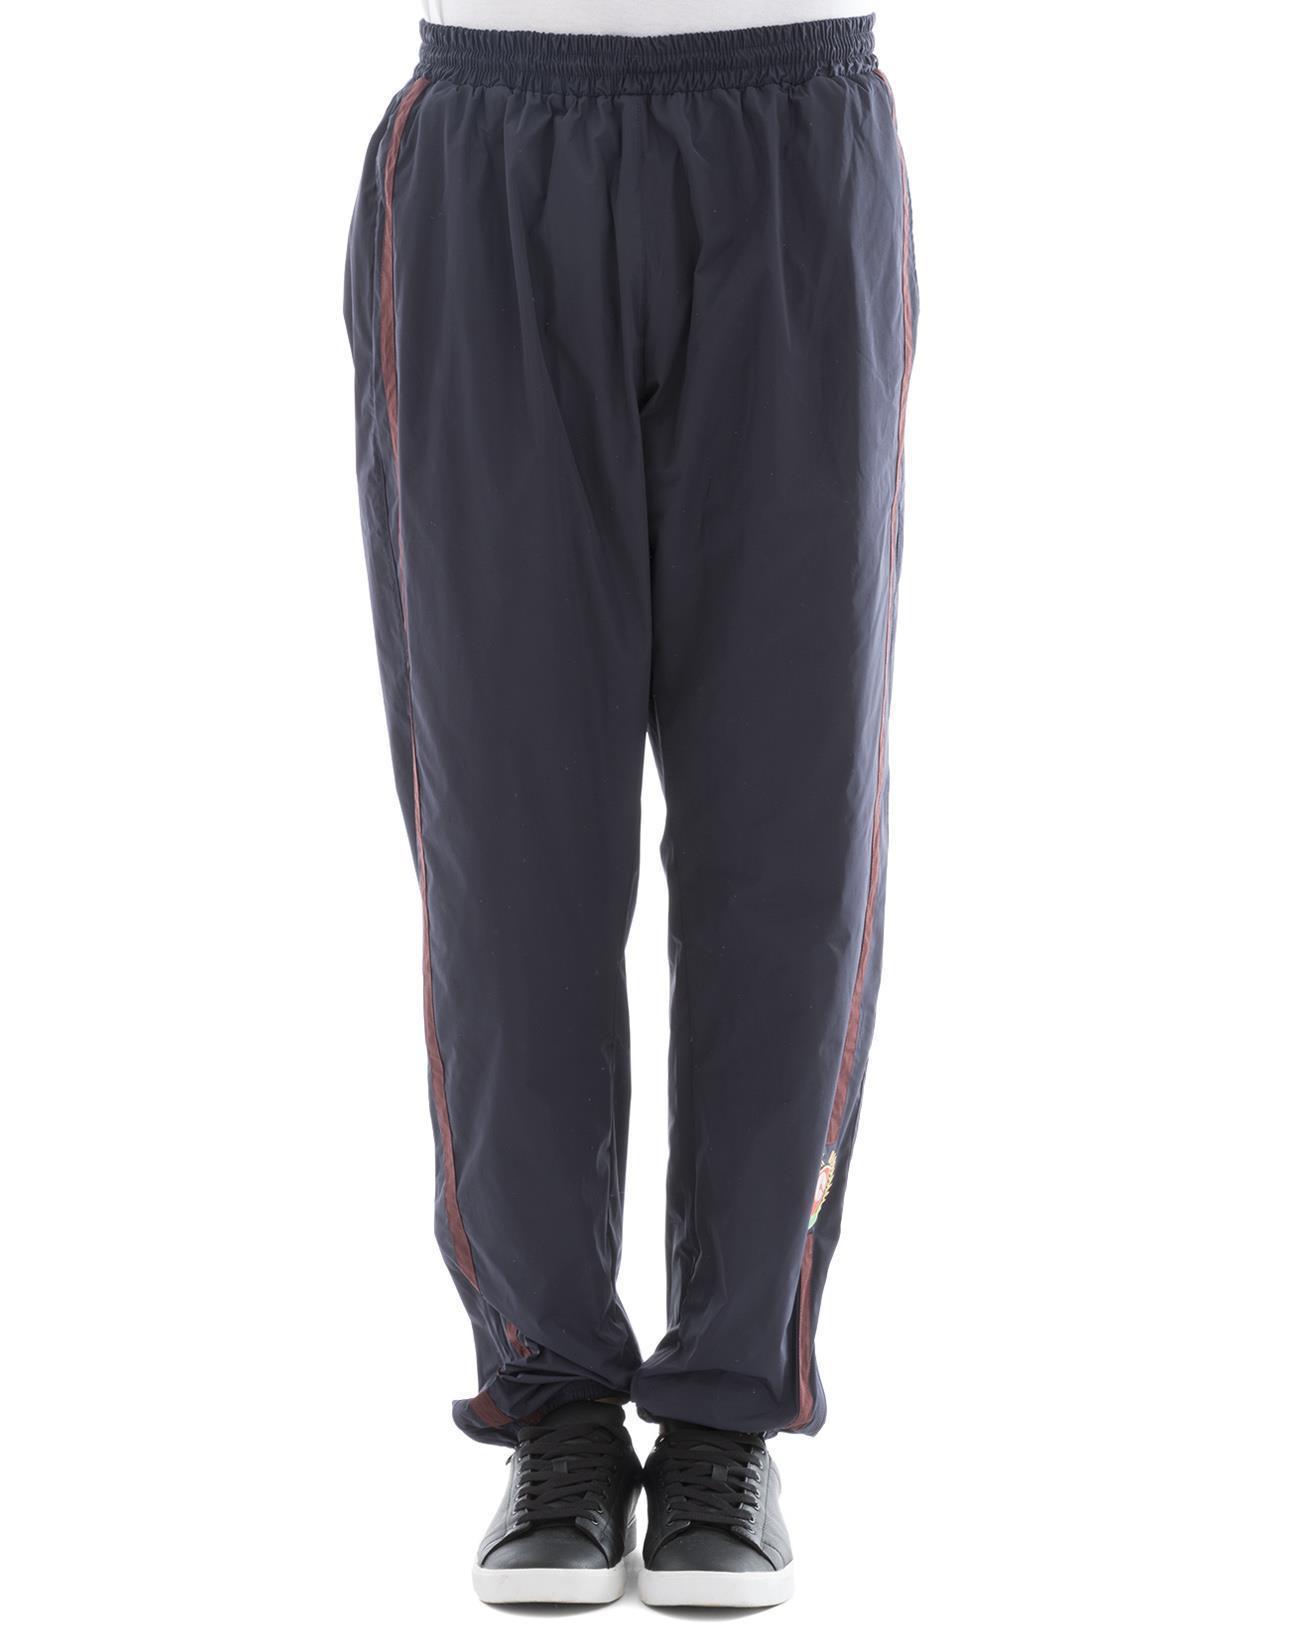 c4be5fa7 Yeezy Season 5 Crest Calabasas Sweatpants in Blue for Men - Lyst